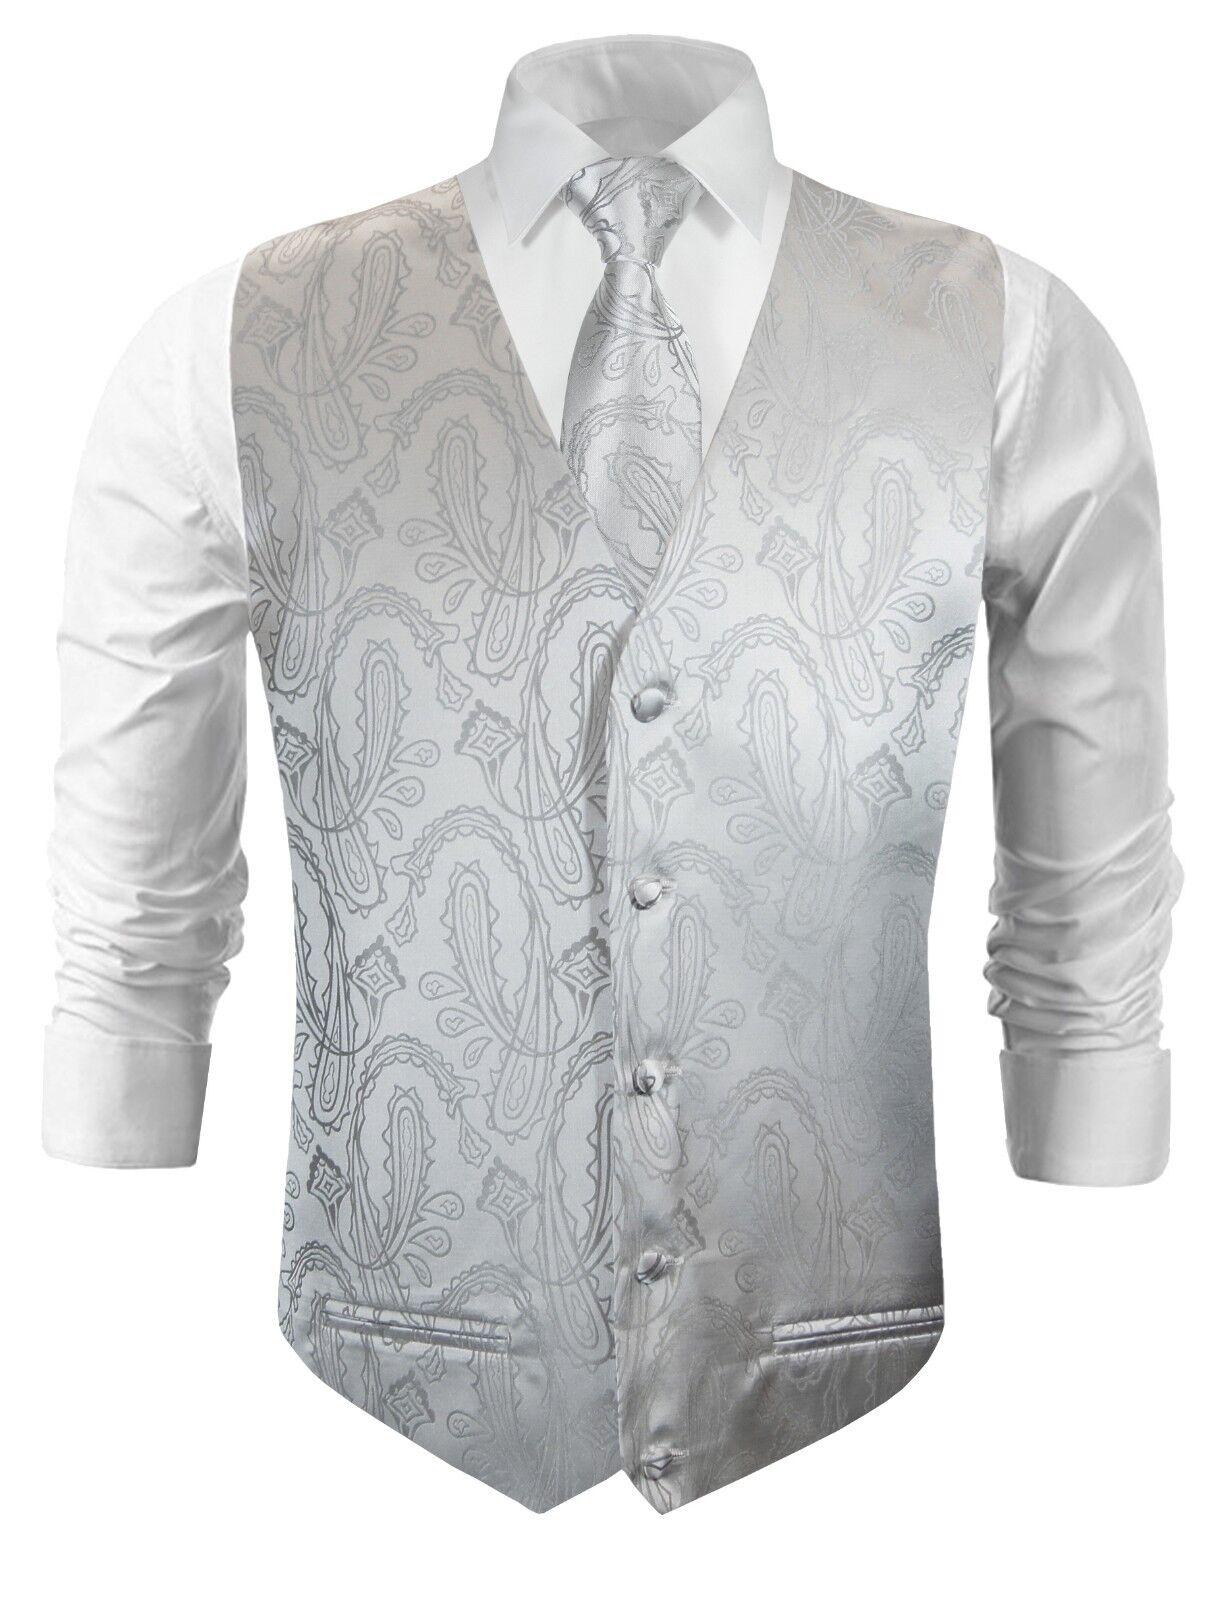 Paul Malone Hochzeitsweste mit Krawatte silber paisley v3